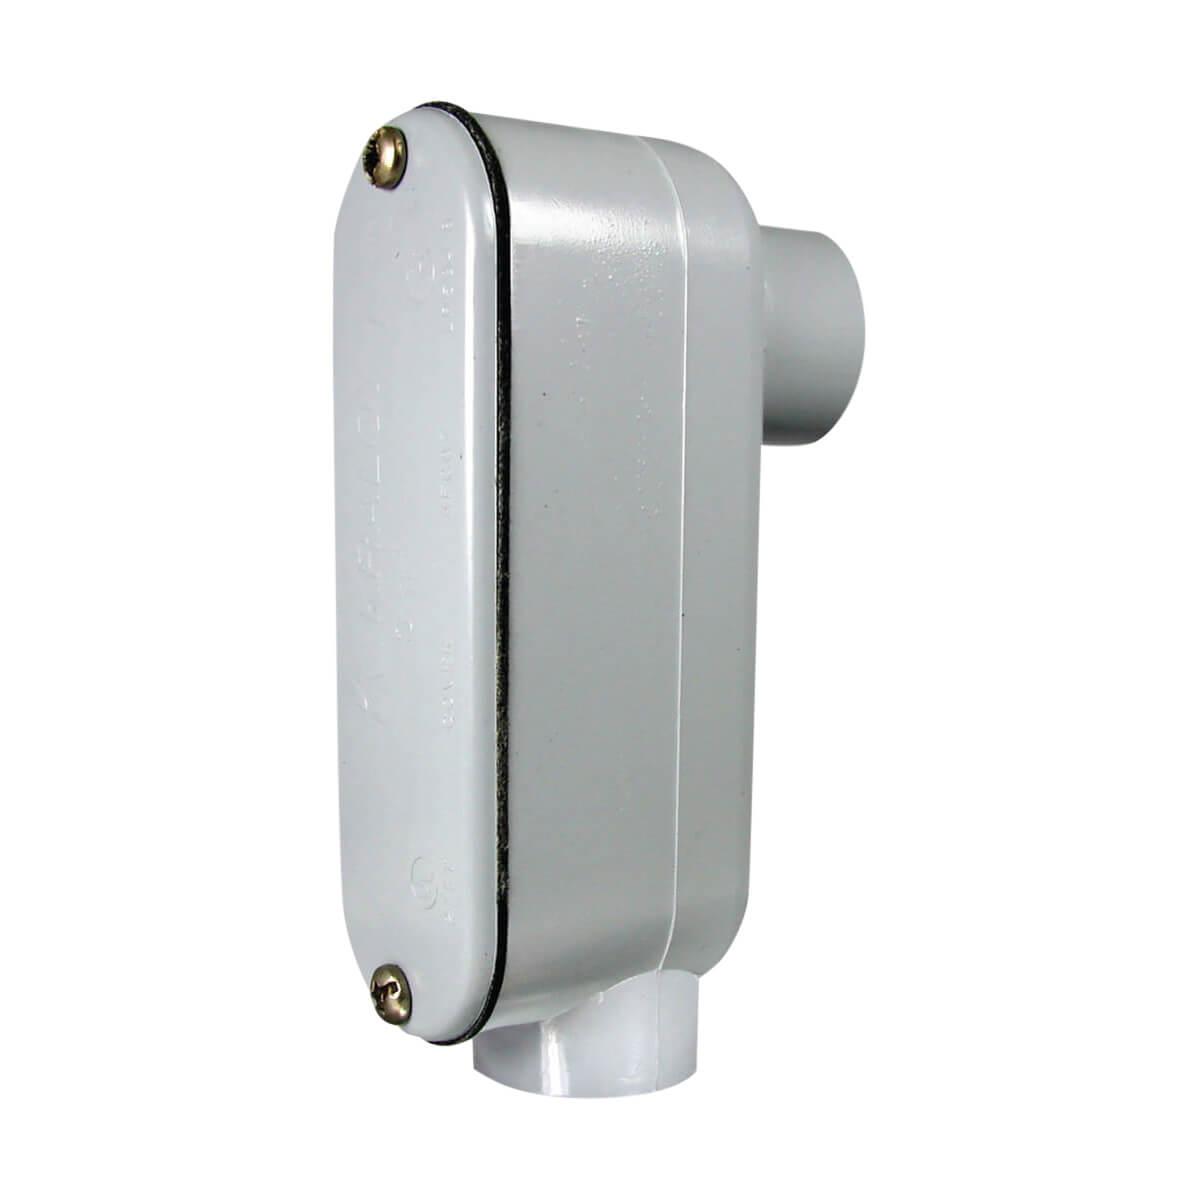 "PVC Counduit Type 'LB' Access Fitting - Hub - 1/2"""